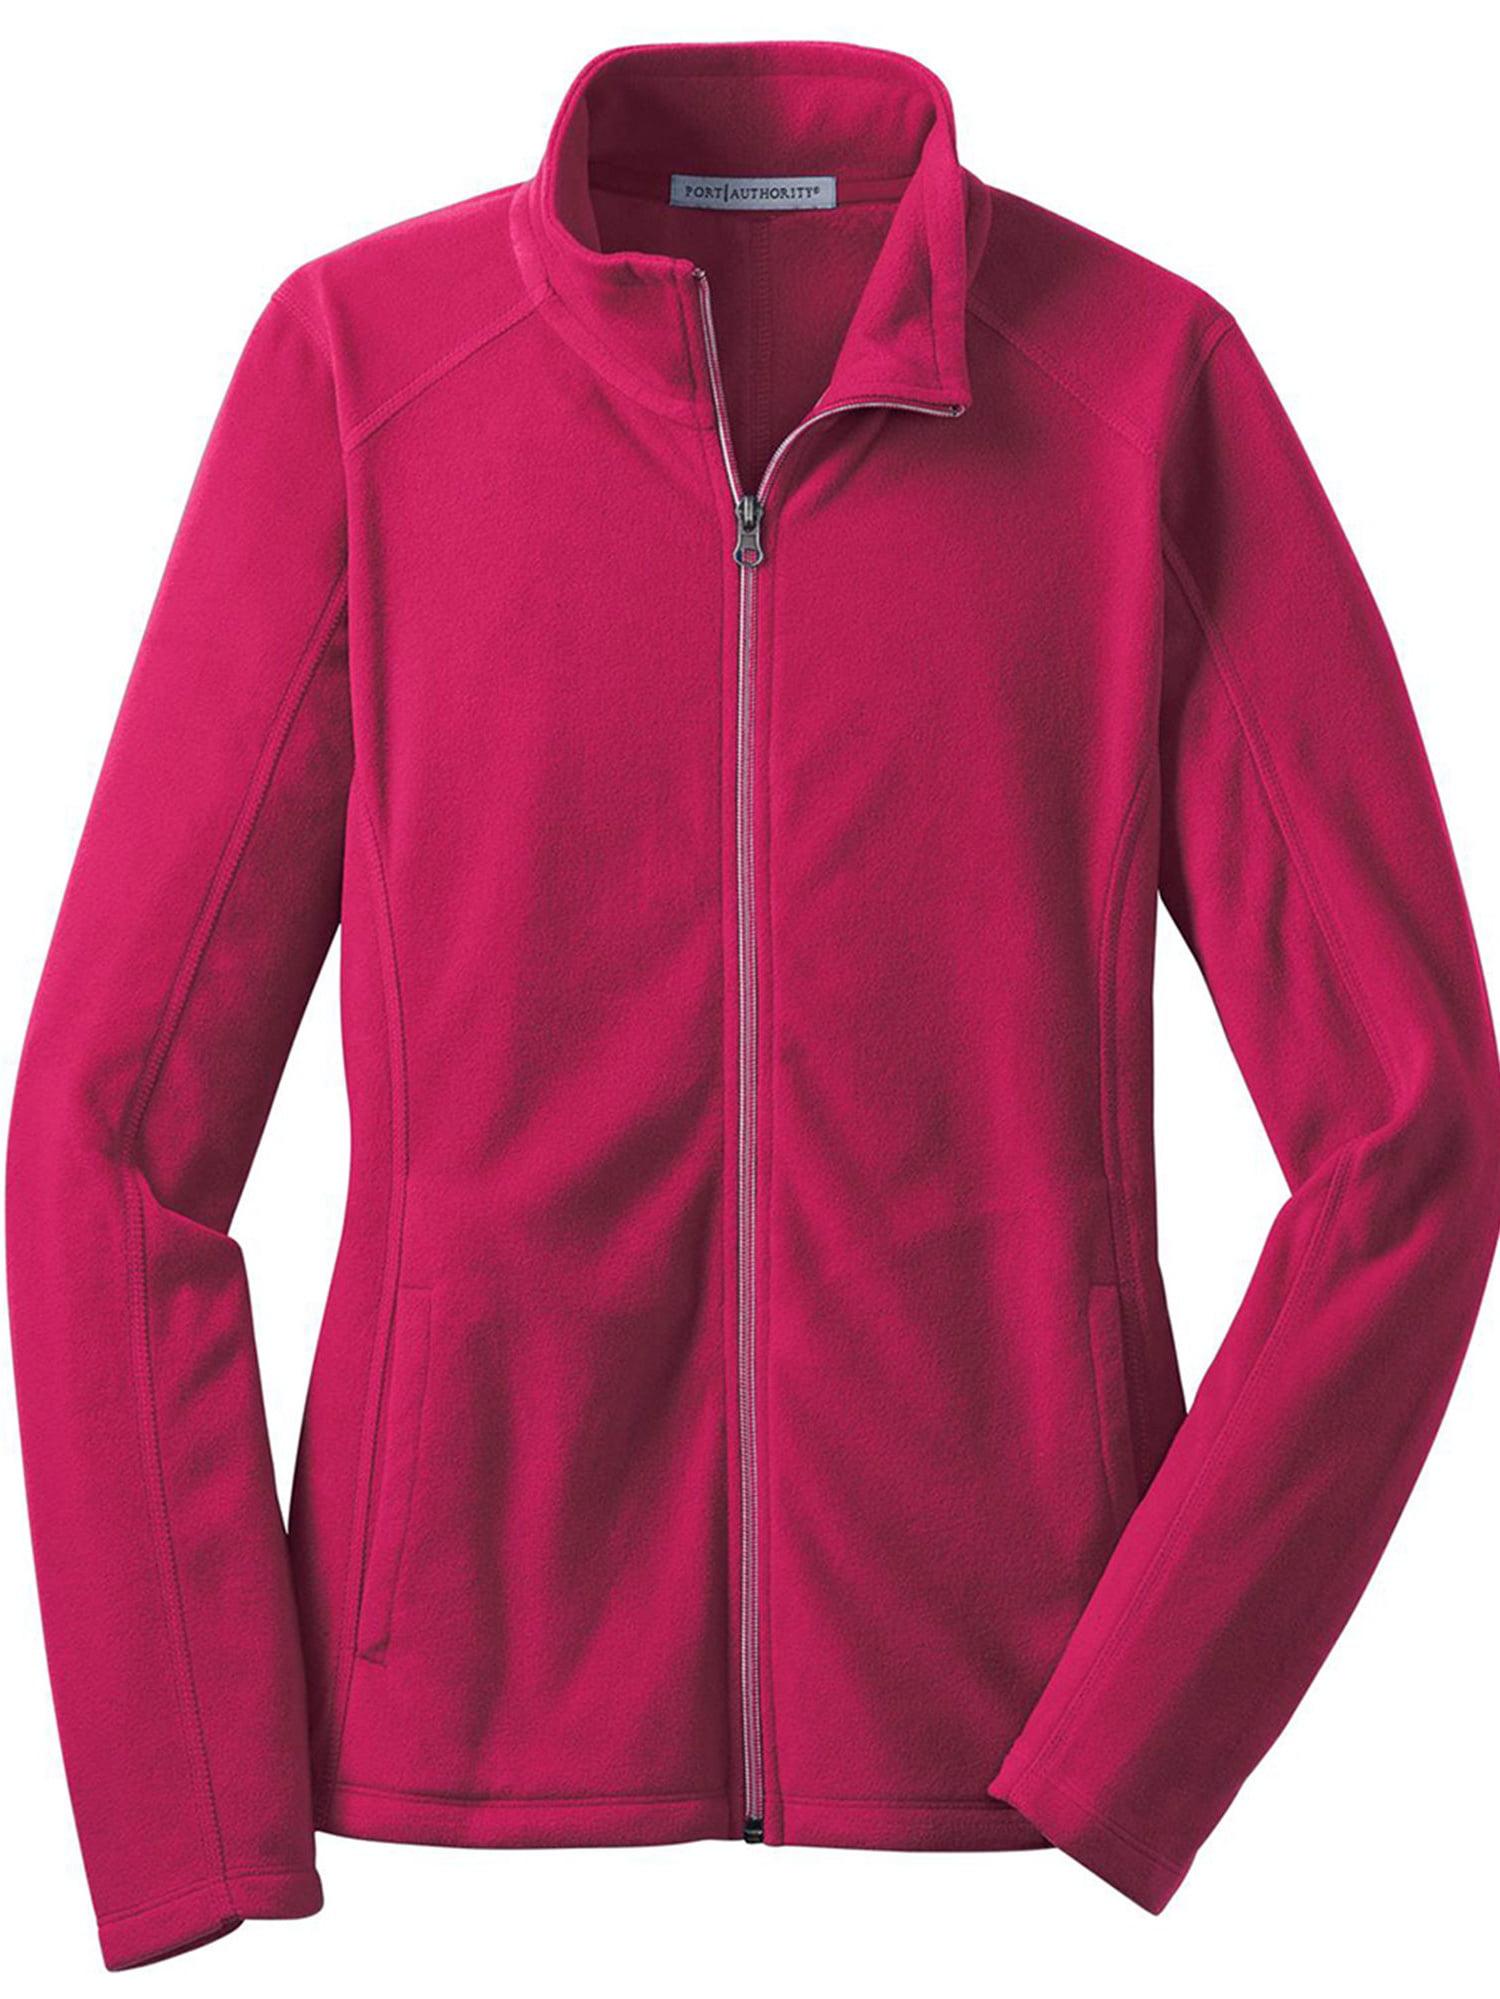 Port Authority Women's Lightweight Microfleece Jacket